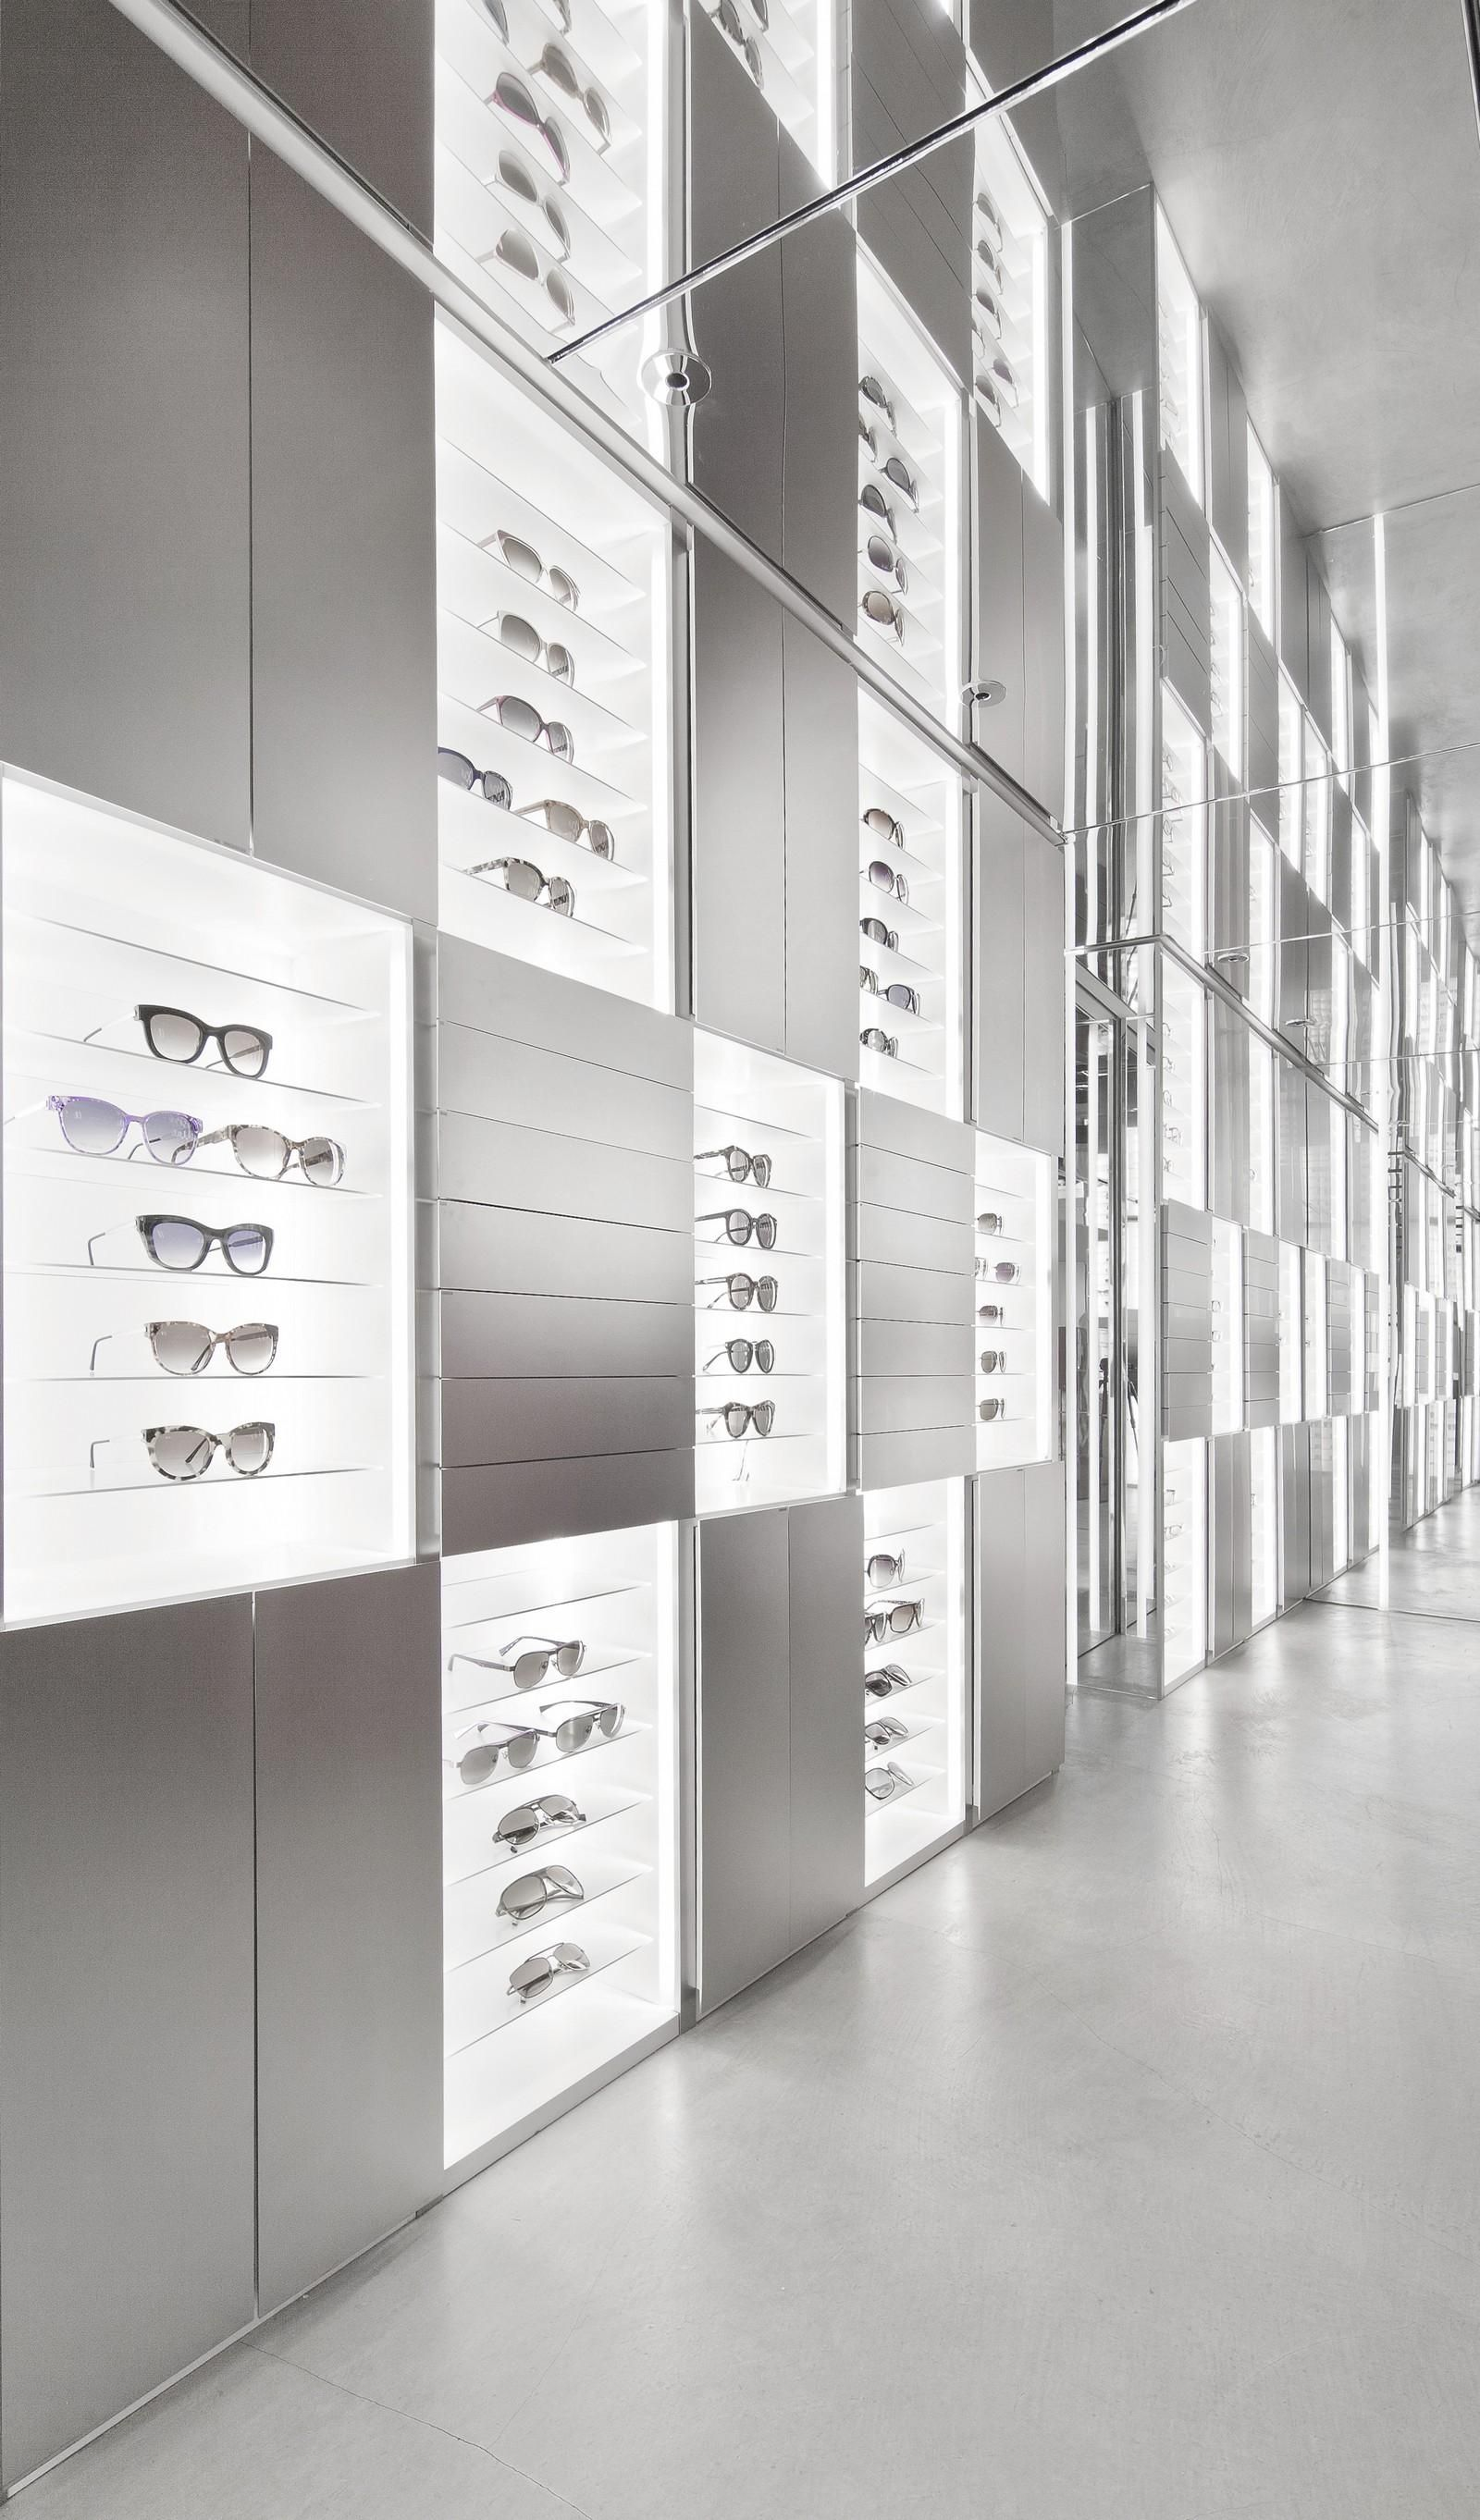 Atelier Archi.Mosphere   Eyewear store   Pinterest 63d9263bd0be